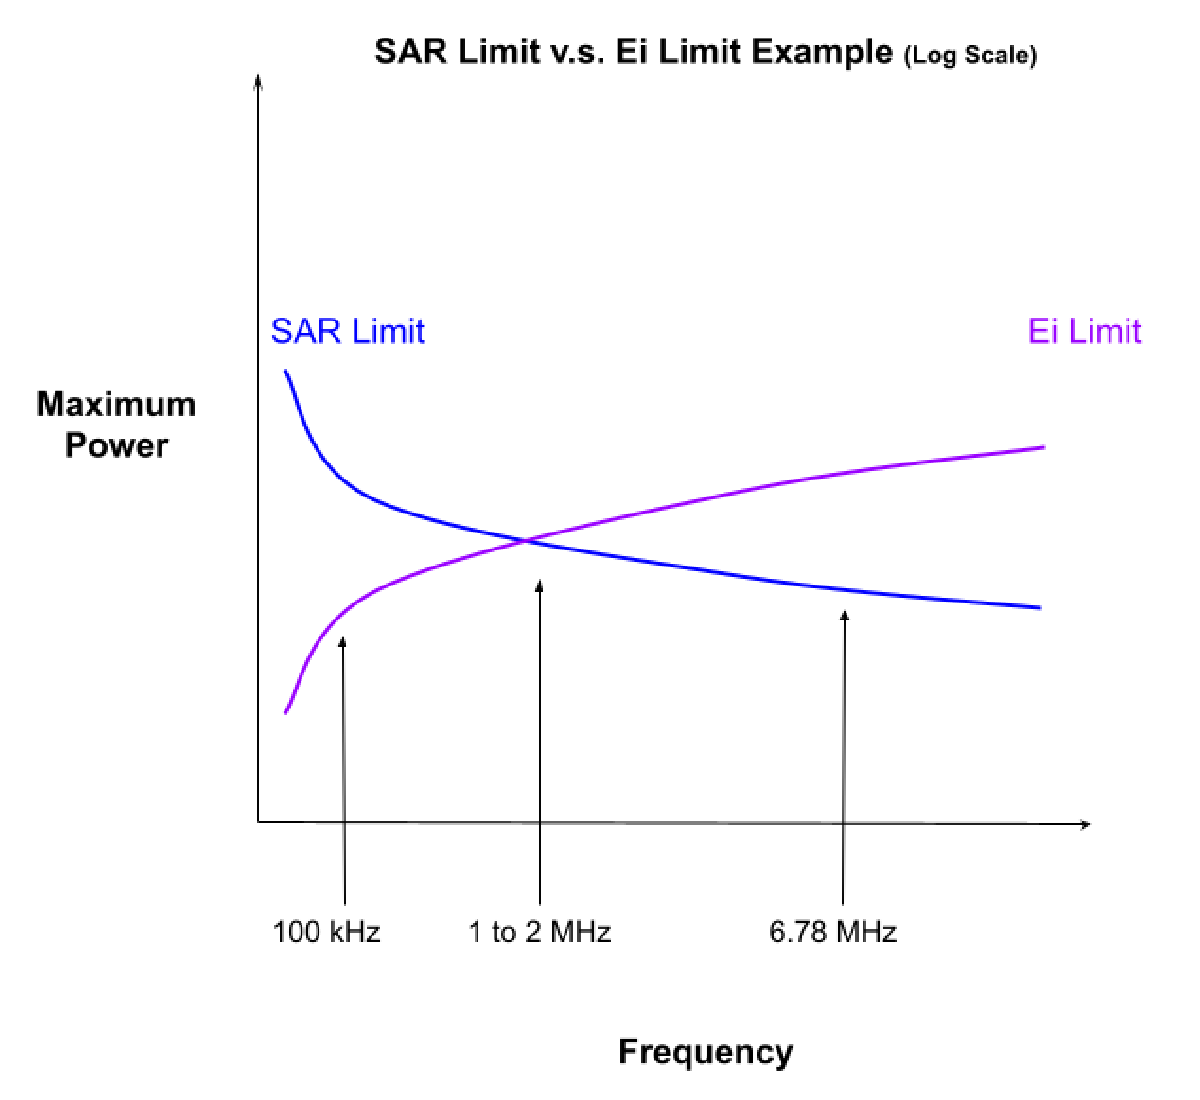 SAR Limit vs Ei Limit